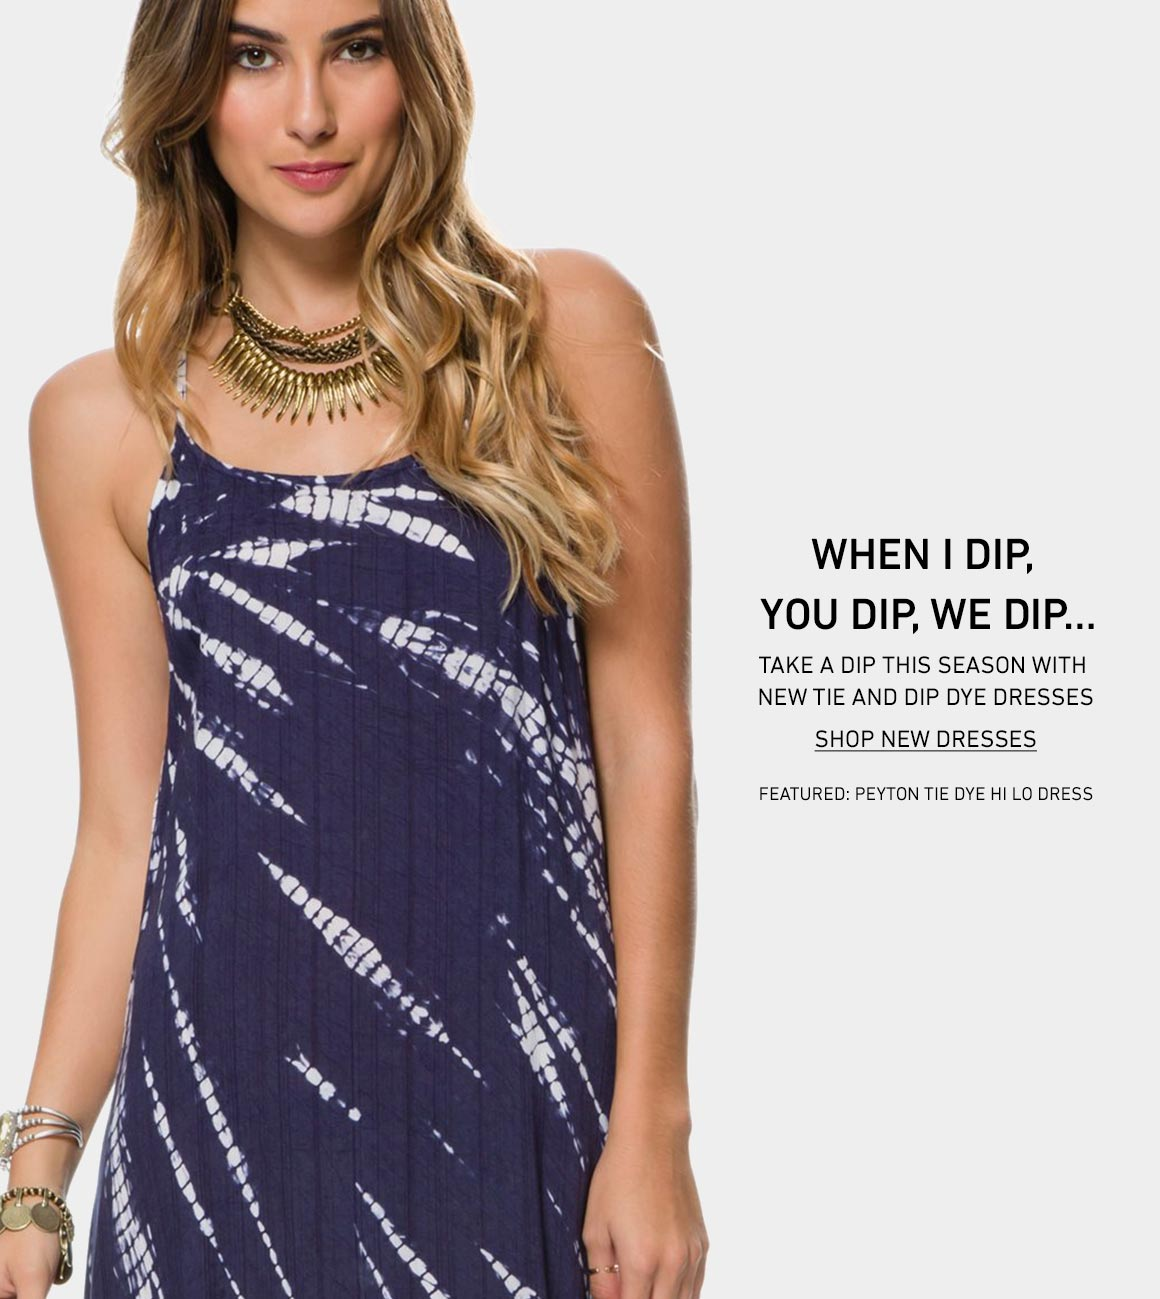 New Tie Dye Dresses